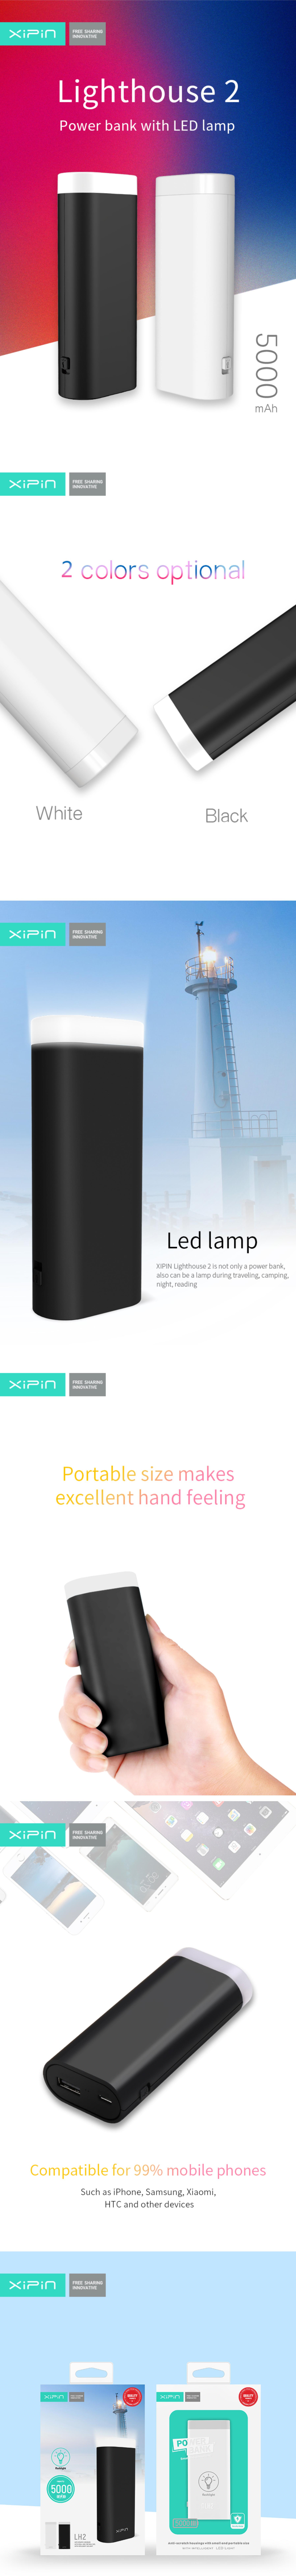 Xipin 5000mAh Power Bank 5V1A Powerbank With LED Lamp Flash Light White LH2